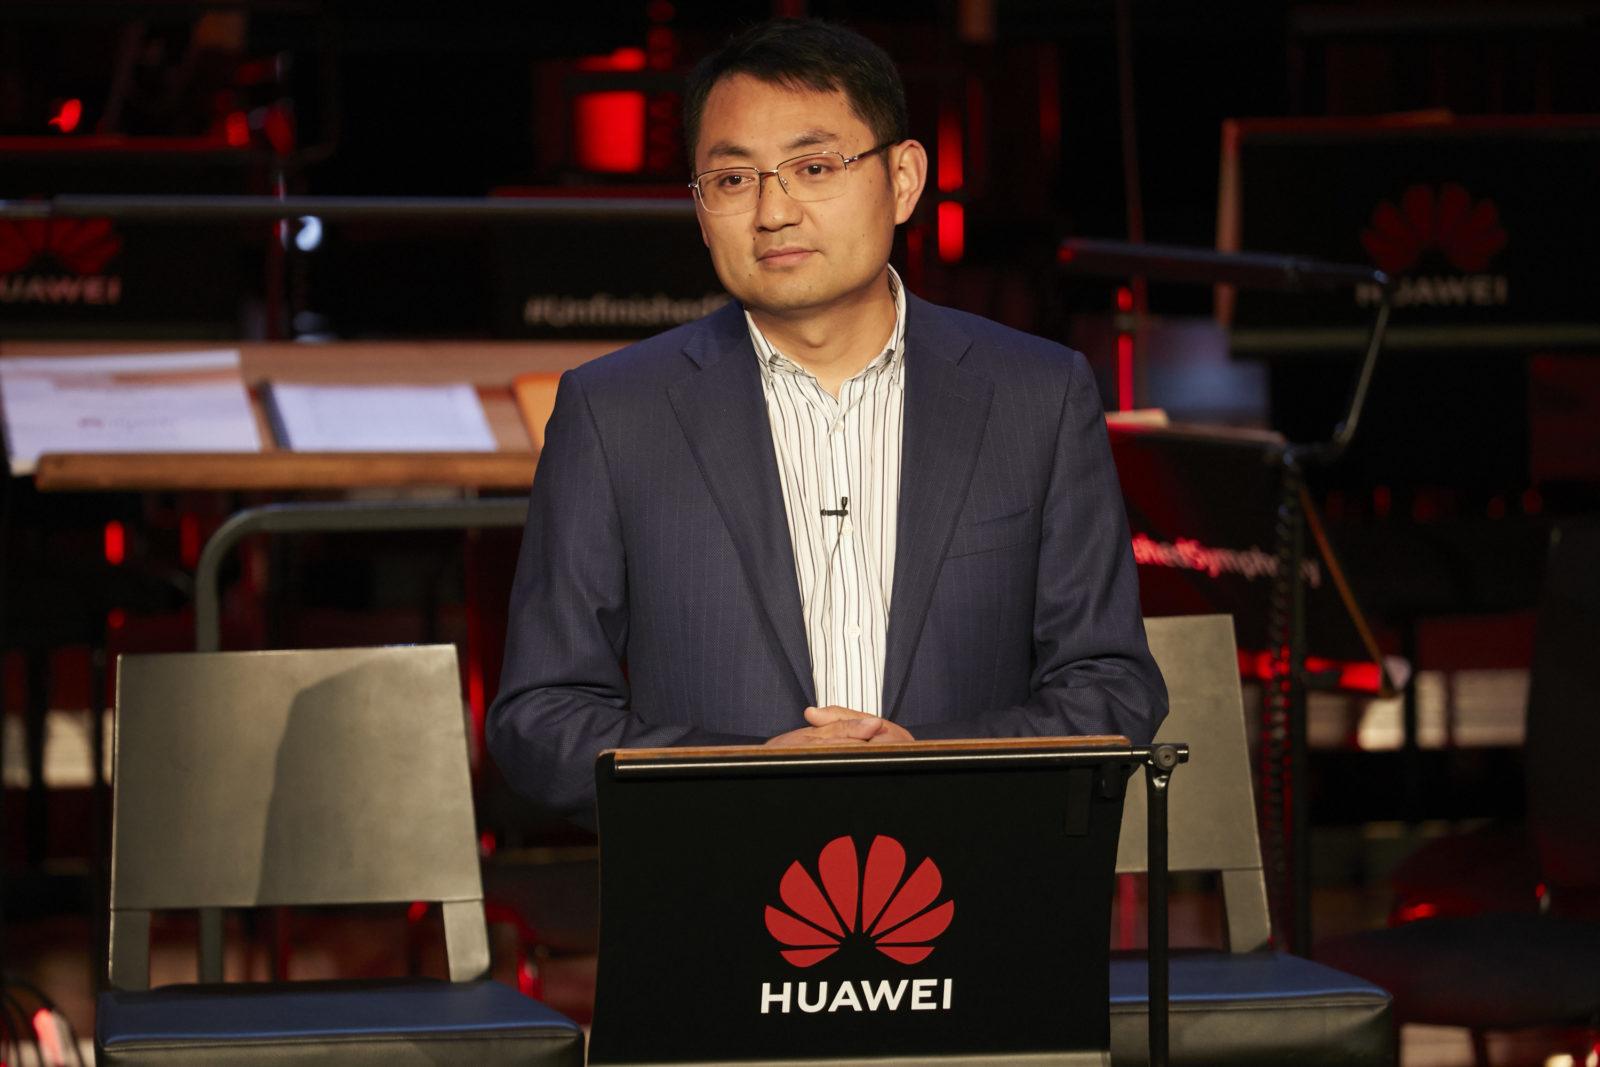 Walther JI,présidentdu Consumer Business Group HuaweiEurop